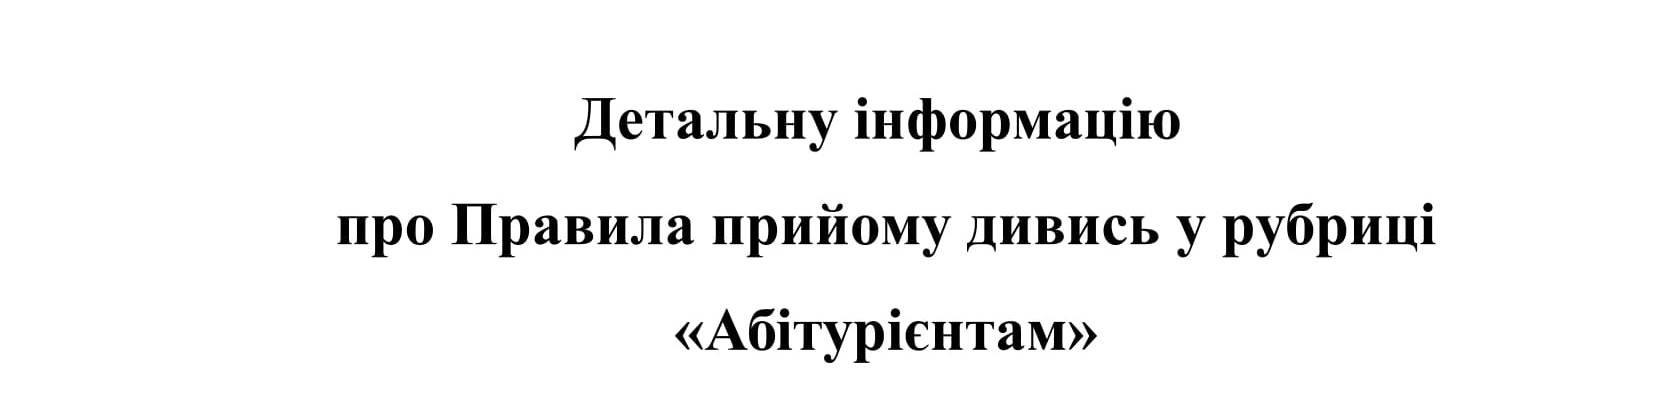 detalna_informaciya.jpg (34.97 Kb)